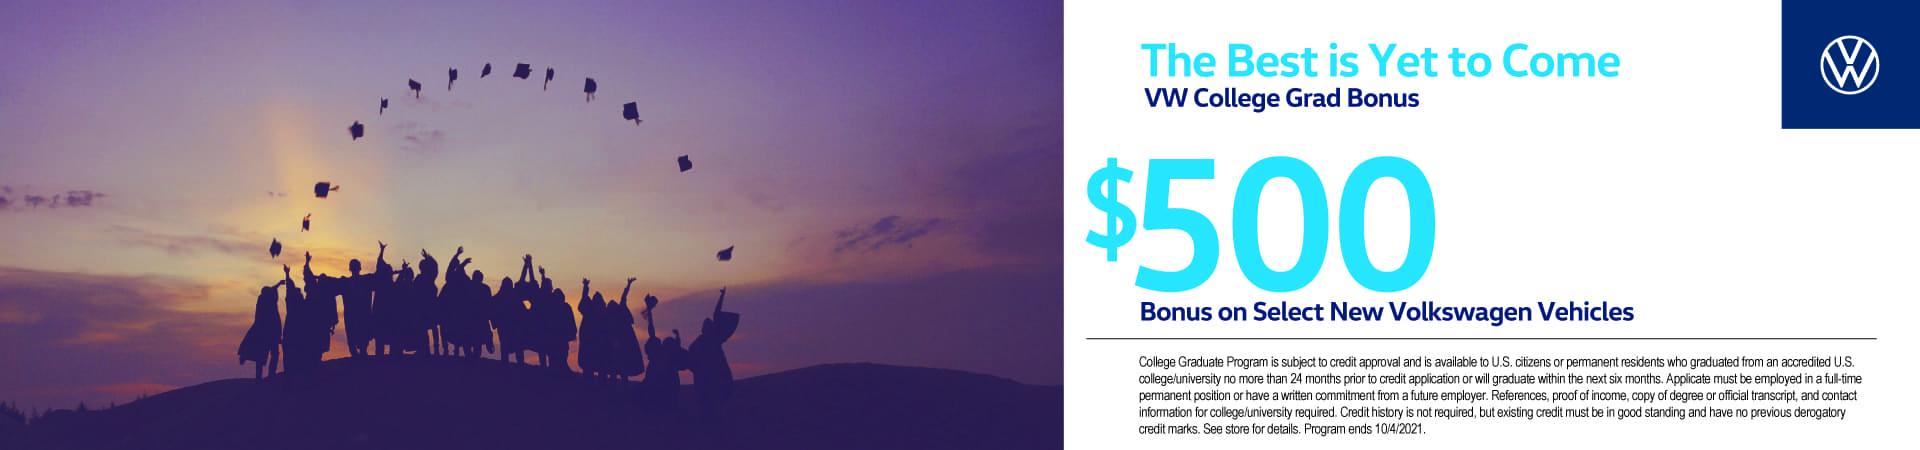 Sep-2021-VW-CS-Slides_500-College-Grad-Rebate